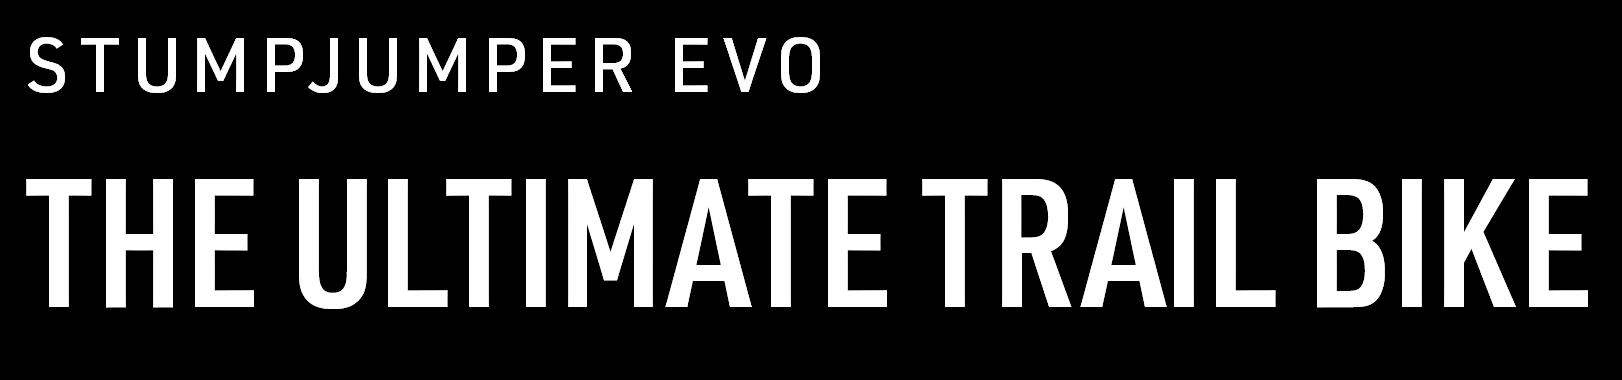 Specialized Stumpjumper EVO | The Ultimate Trail Bike